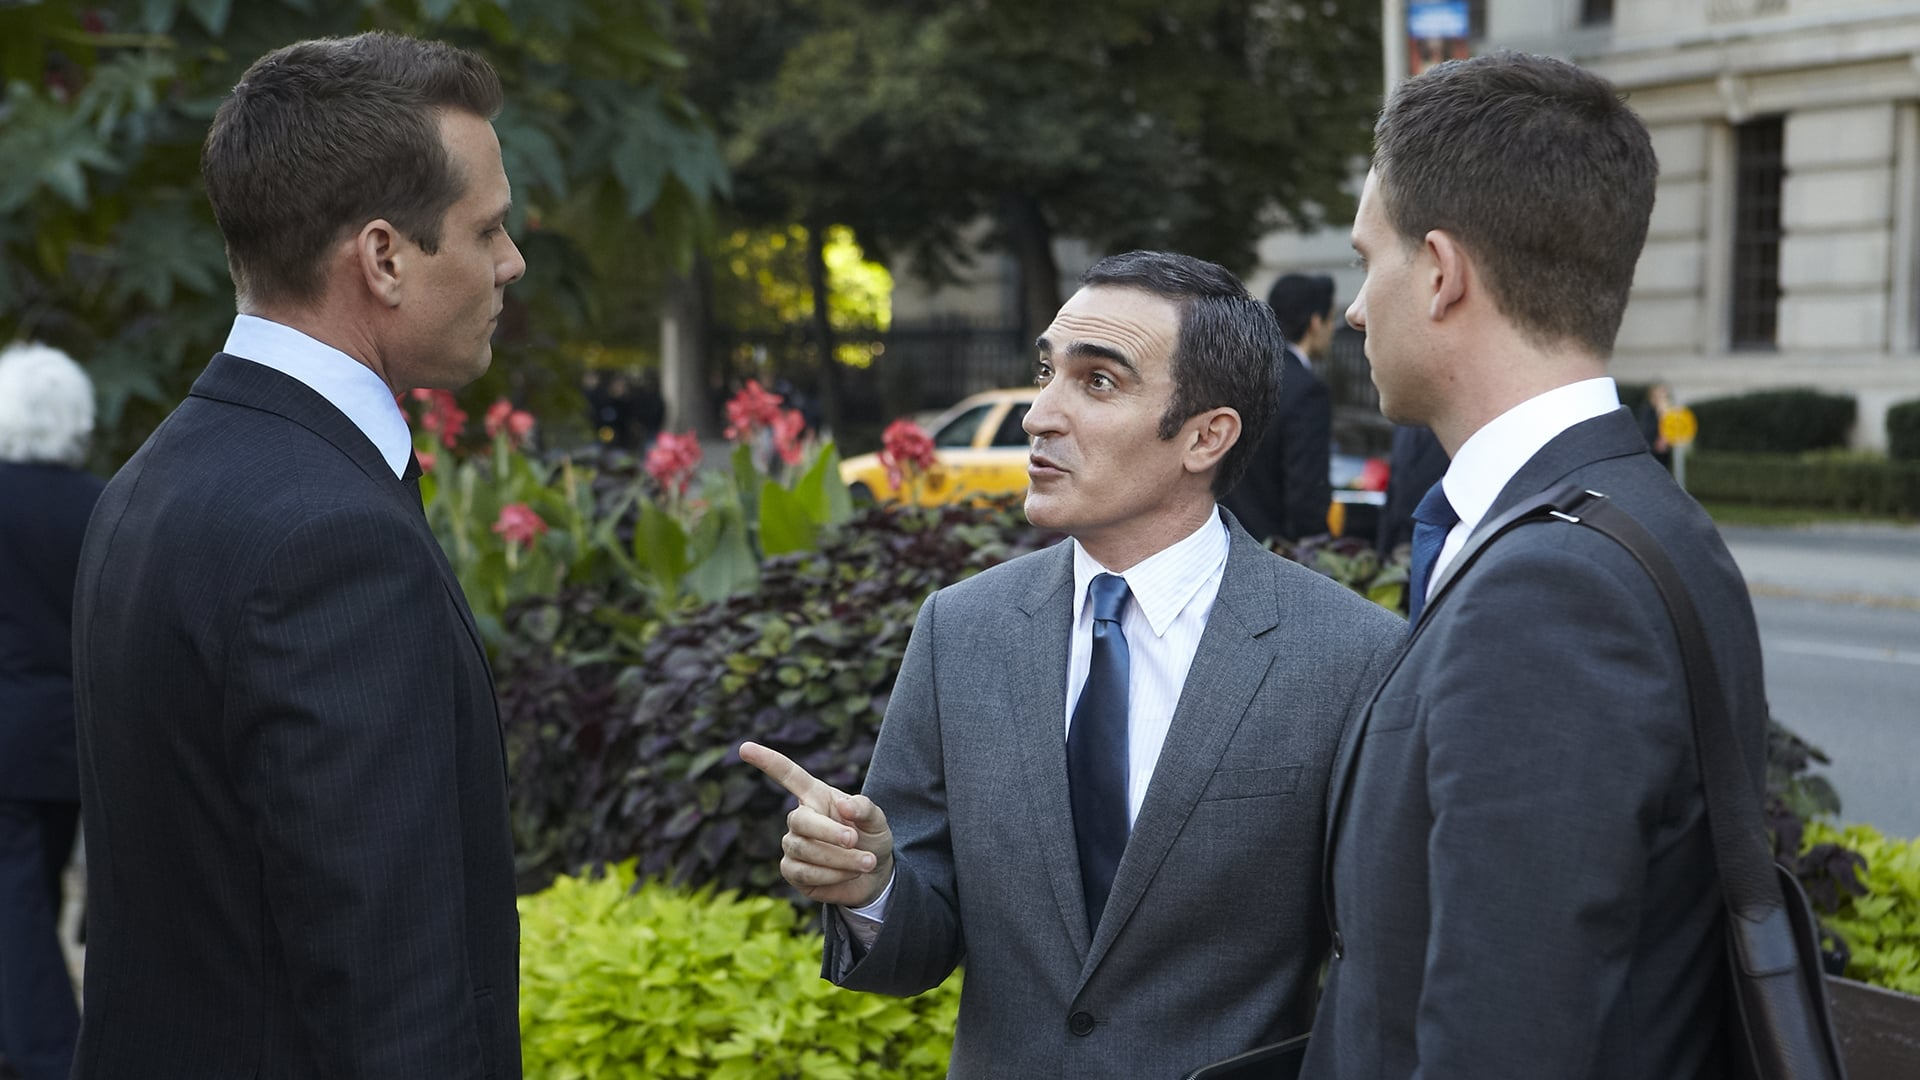 Suits - Season 3 Episode 13 : Moot Point